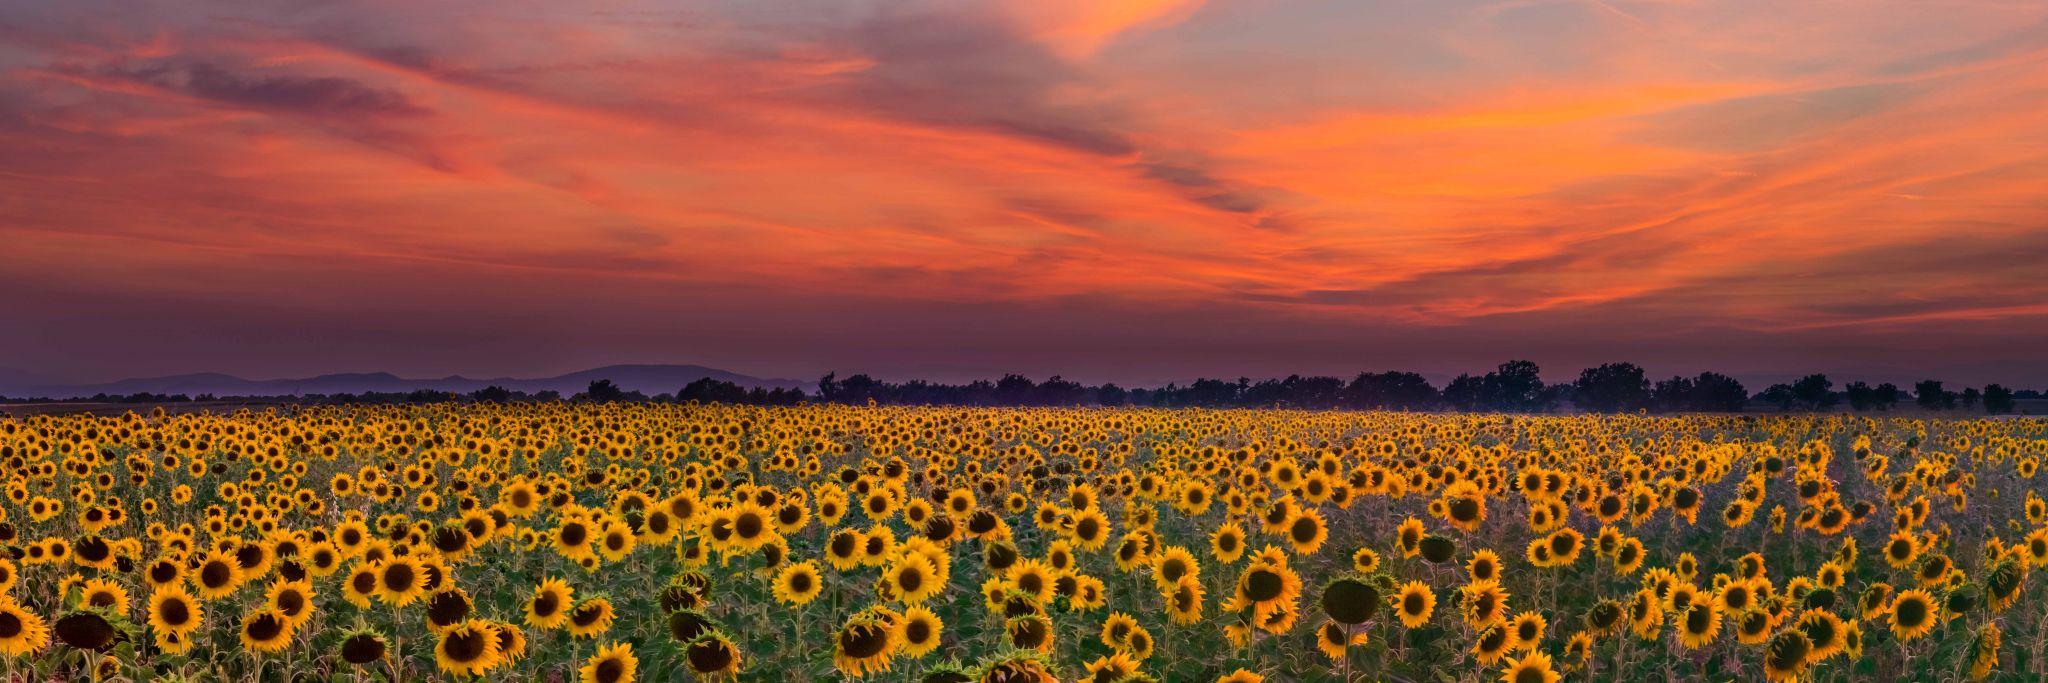 Sunflower Fields of Valensole, France